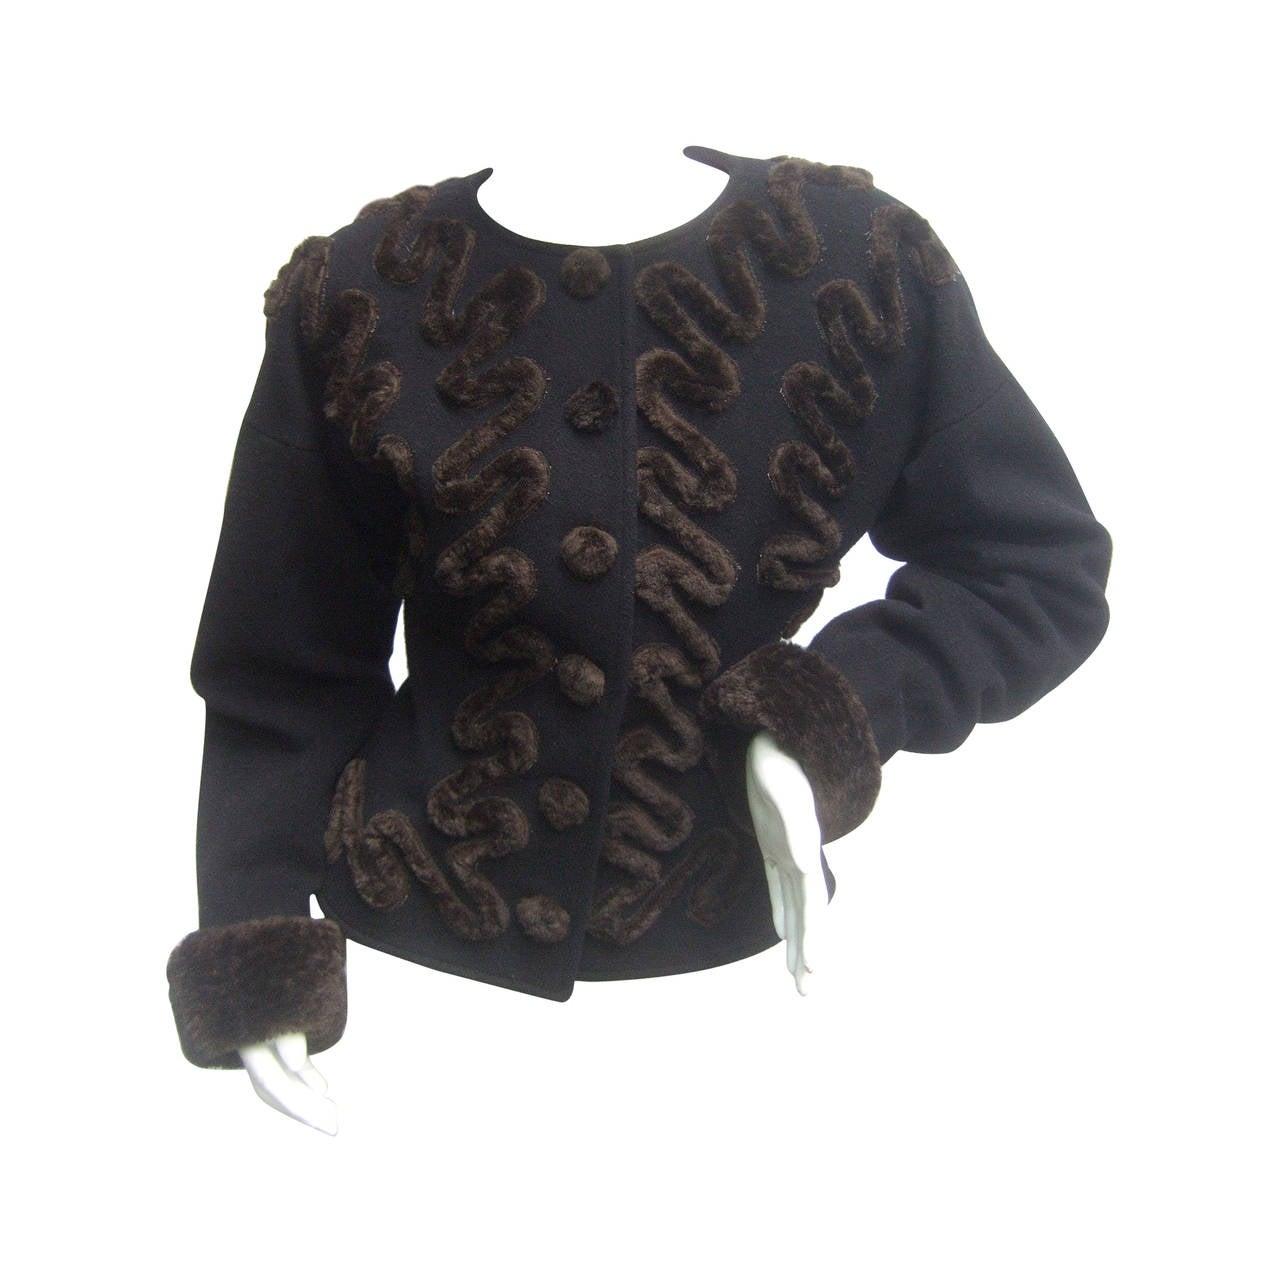 Fendi Italy Black Wool Applique Faux Fur Jacket Size 42 ca 1990s